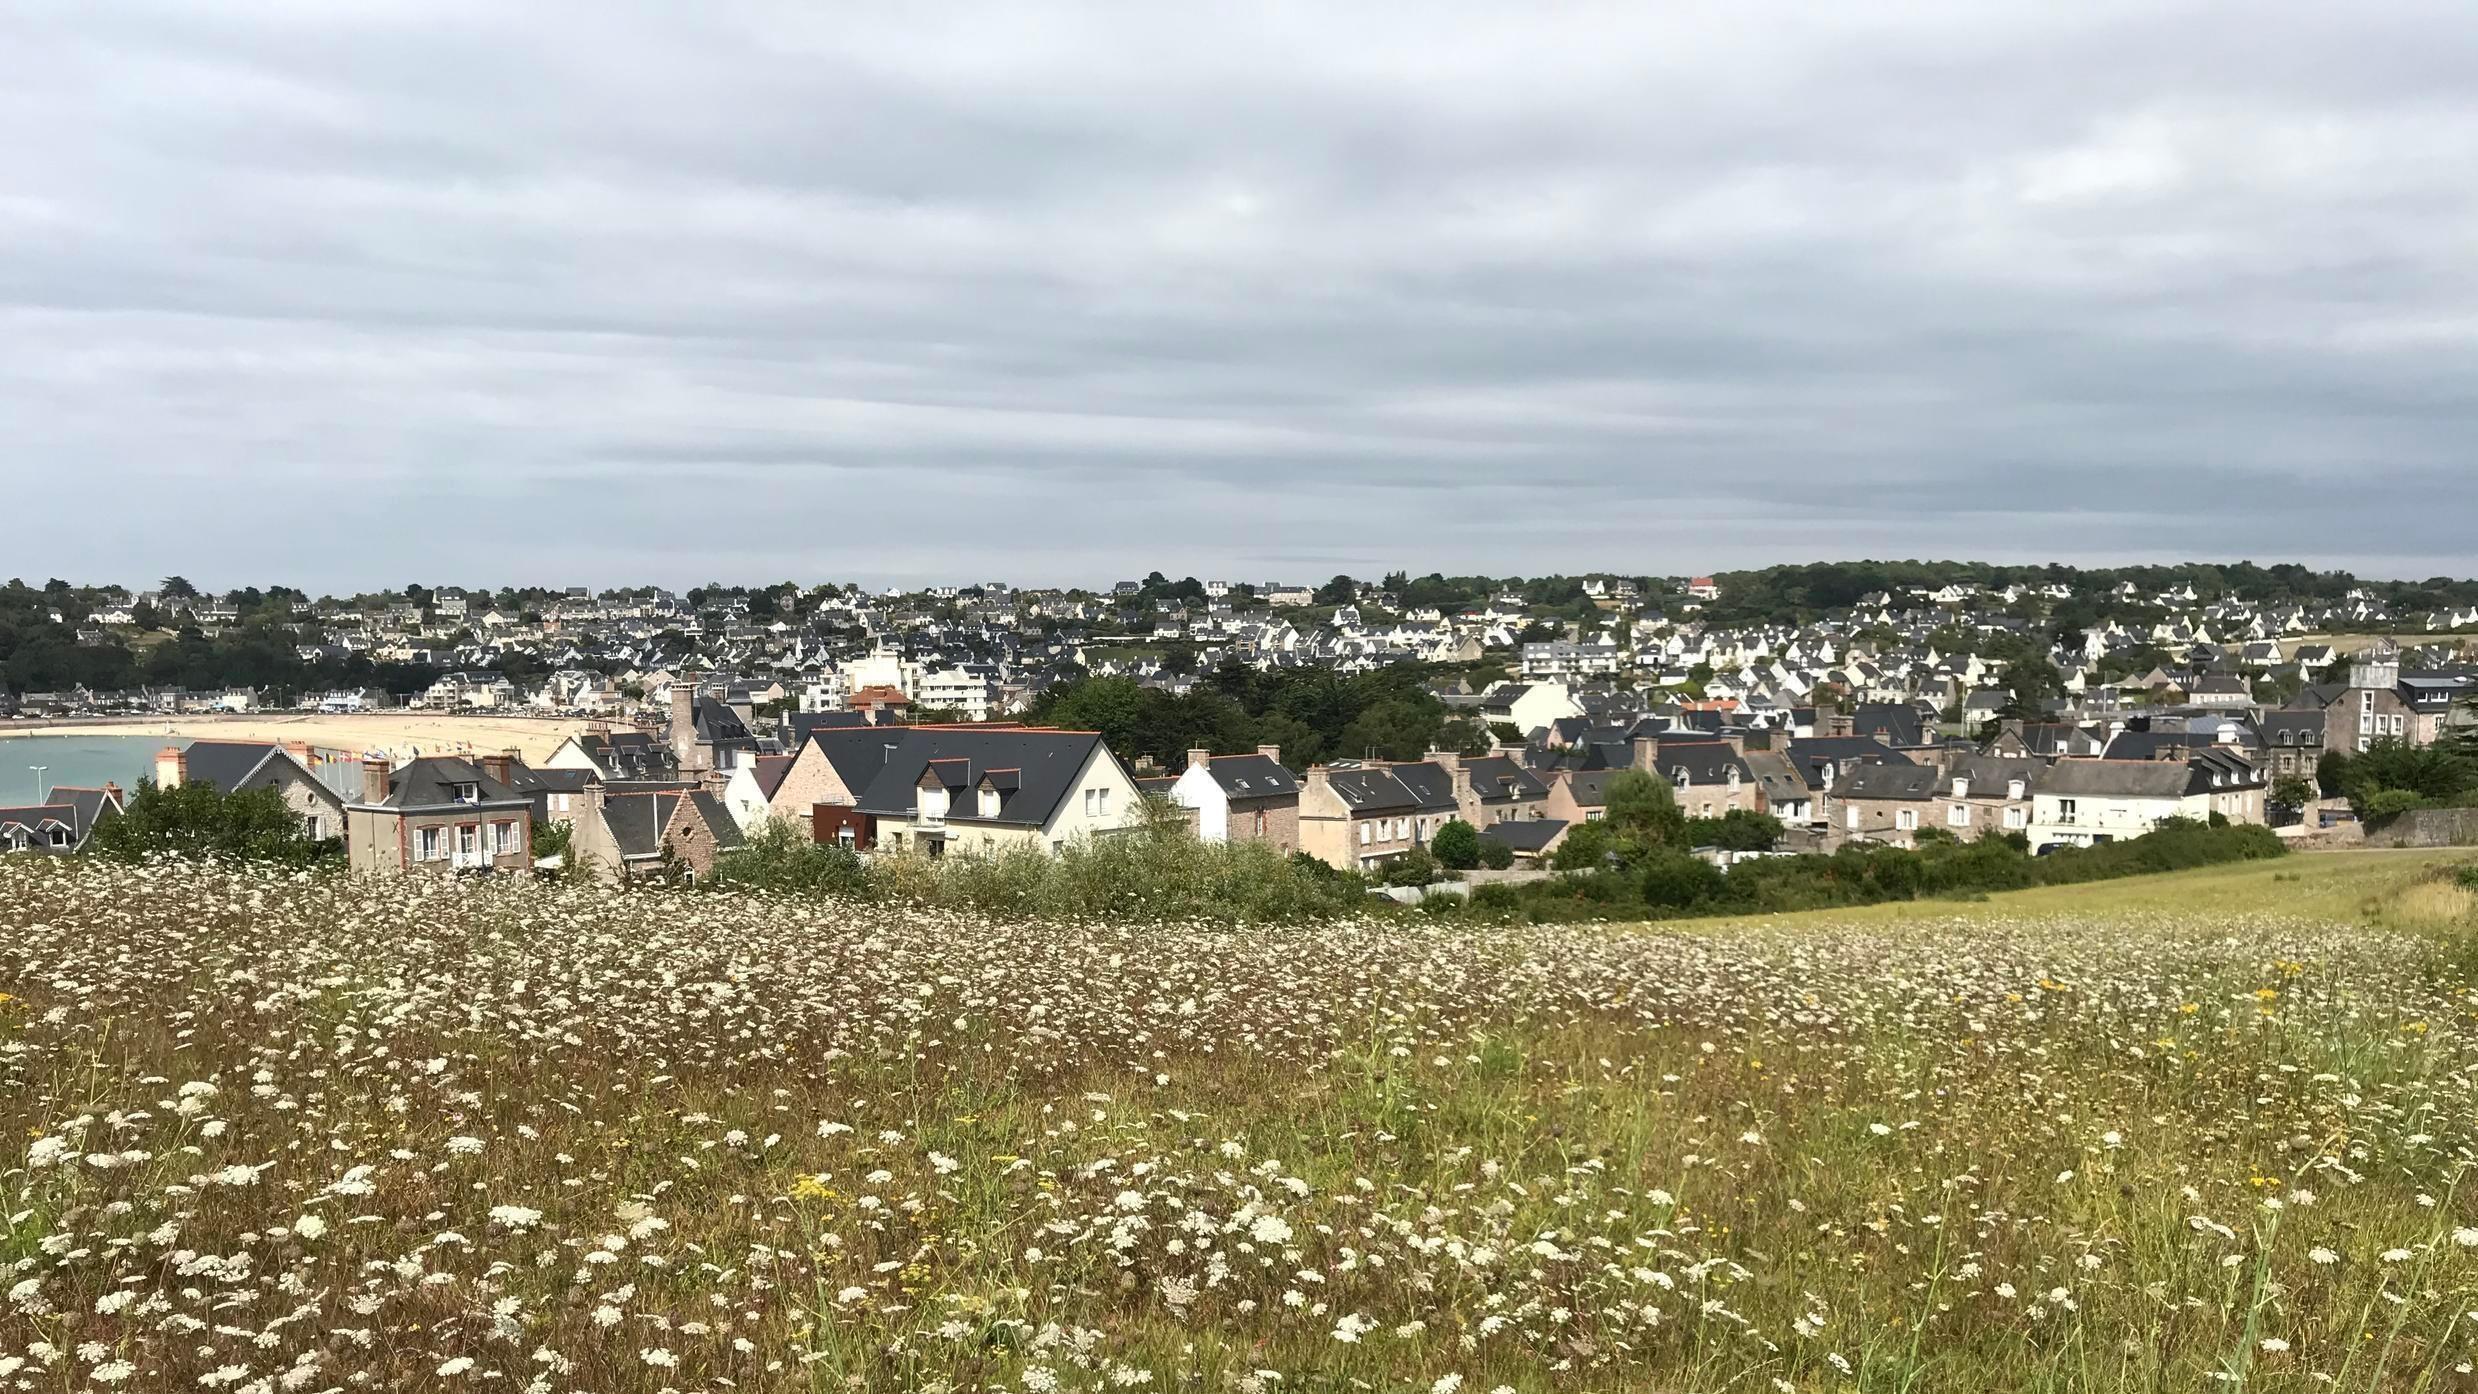 2020-08-14 france britanny bretagne erquy asterix gaulish village